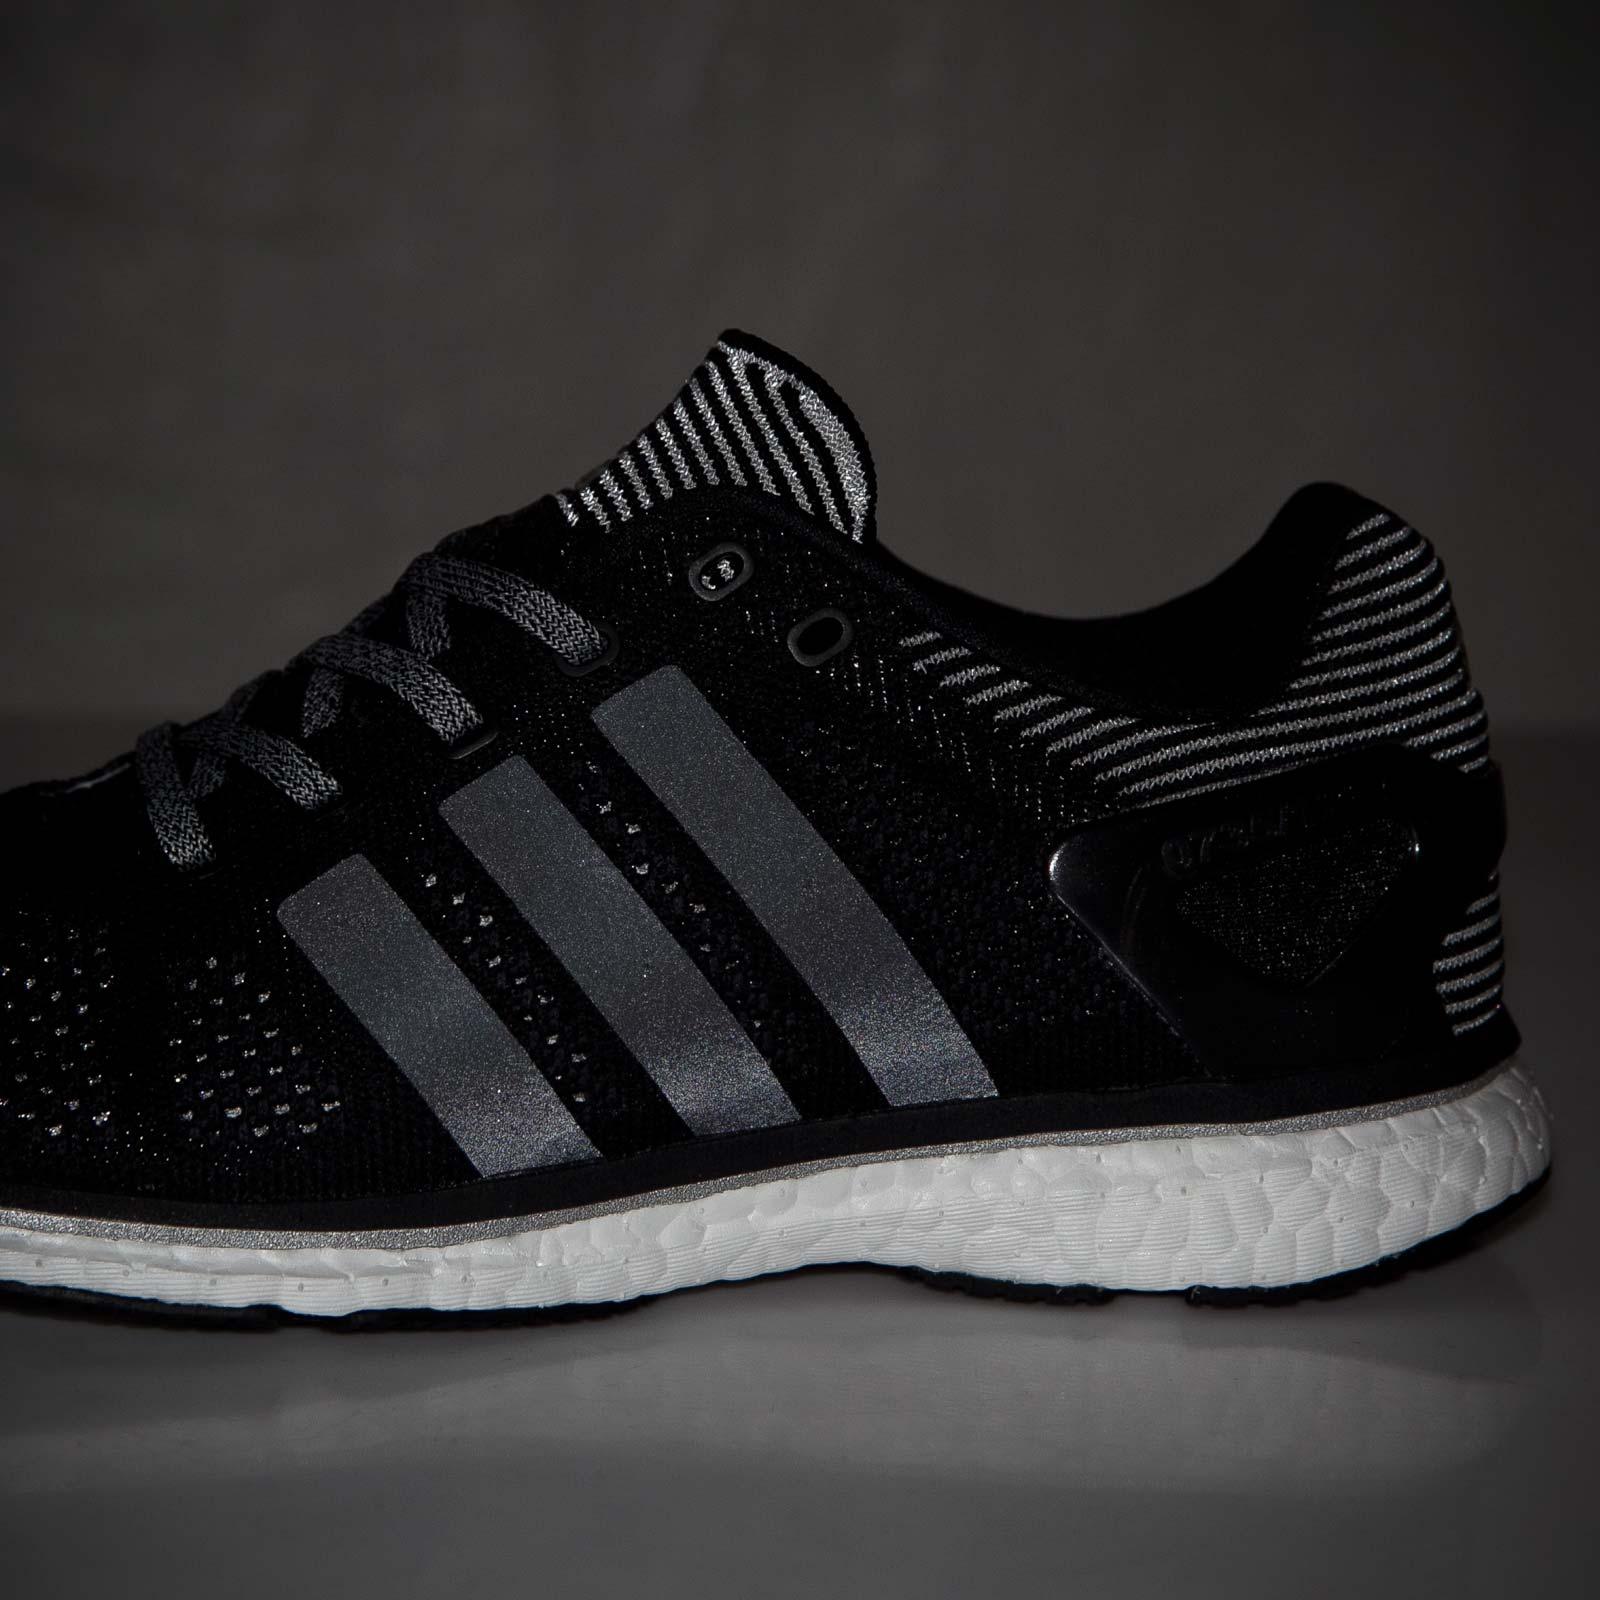 Best Source for Cheap Adidas Adizero Prime Boost Ltd